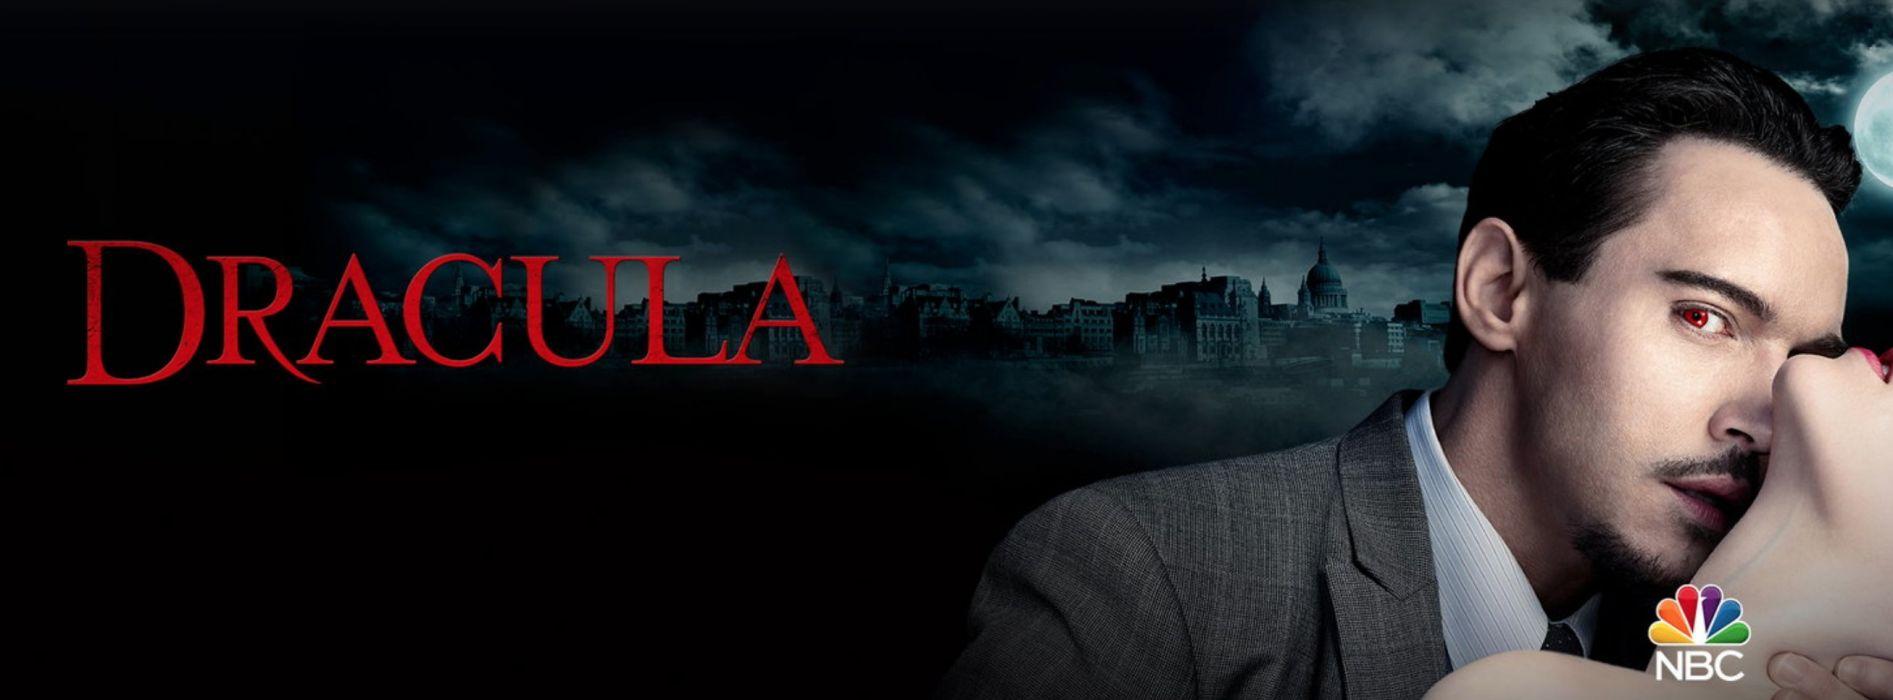 DRACULA horror vampire series dark drama fantasy fantasy 1dracula wallpaper